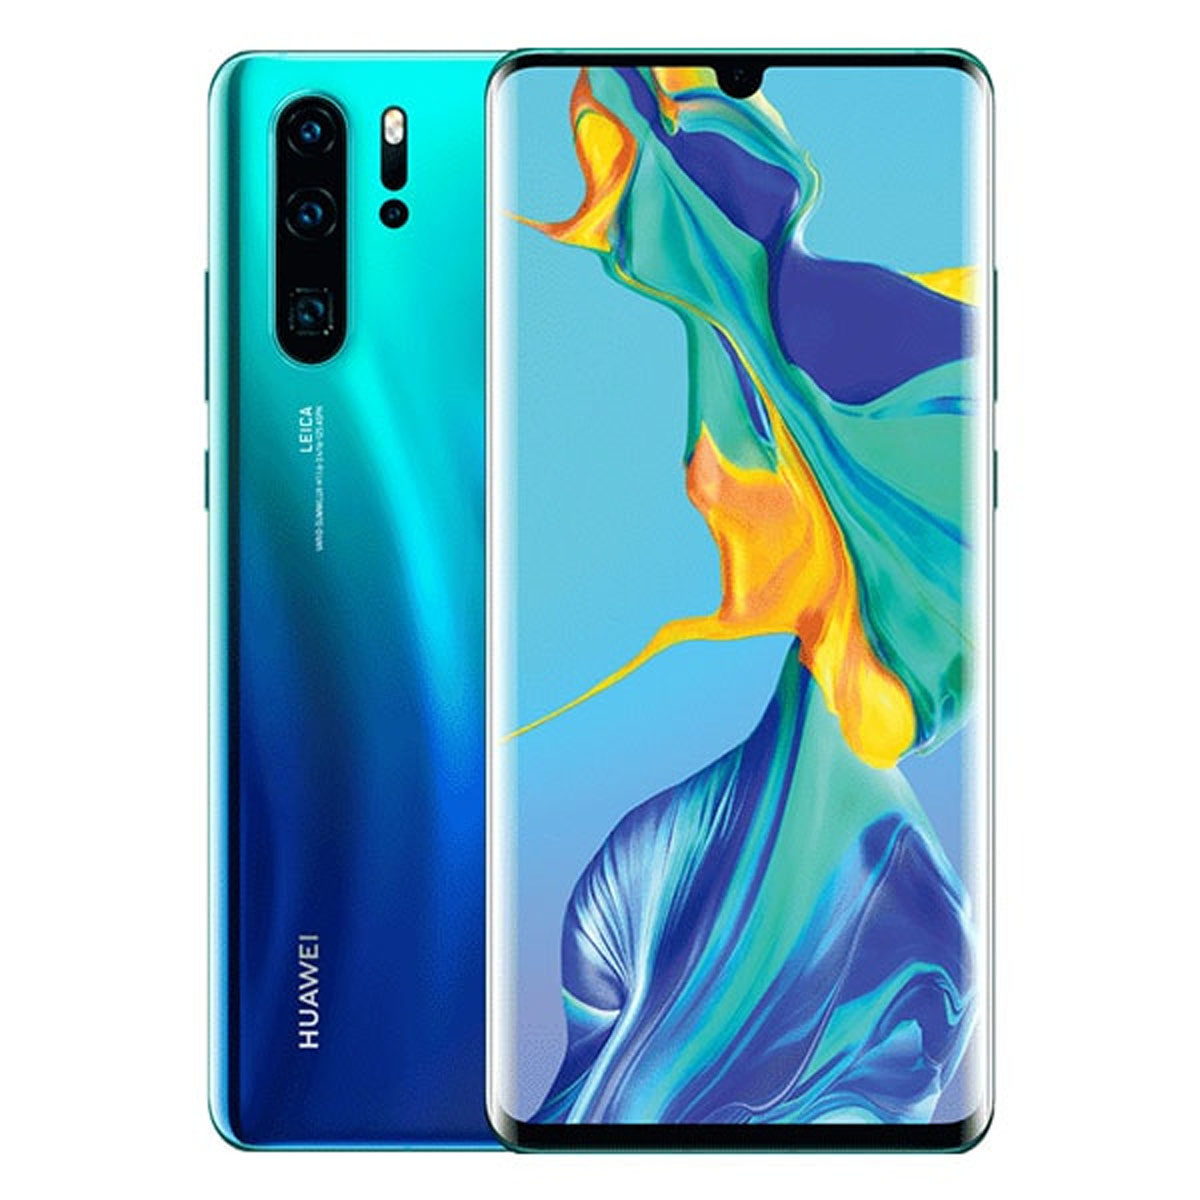 Huawei p30 pro 8gb/128gb aurora dual